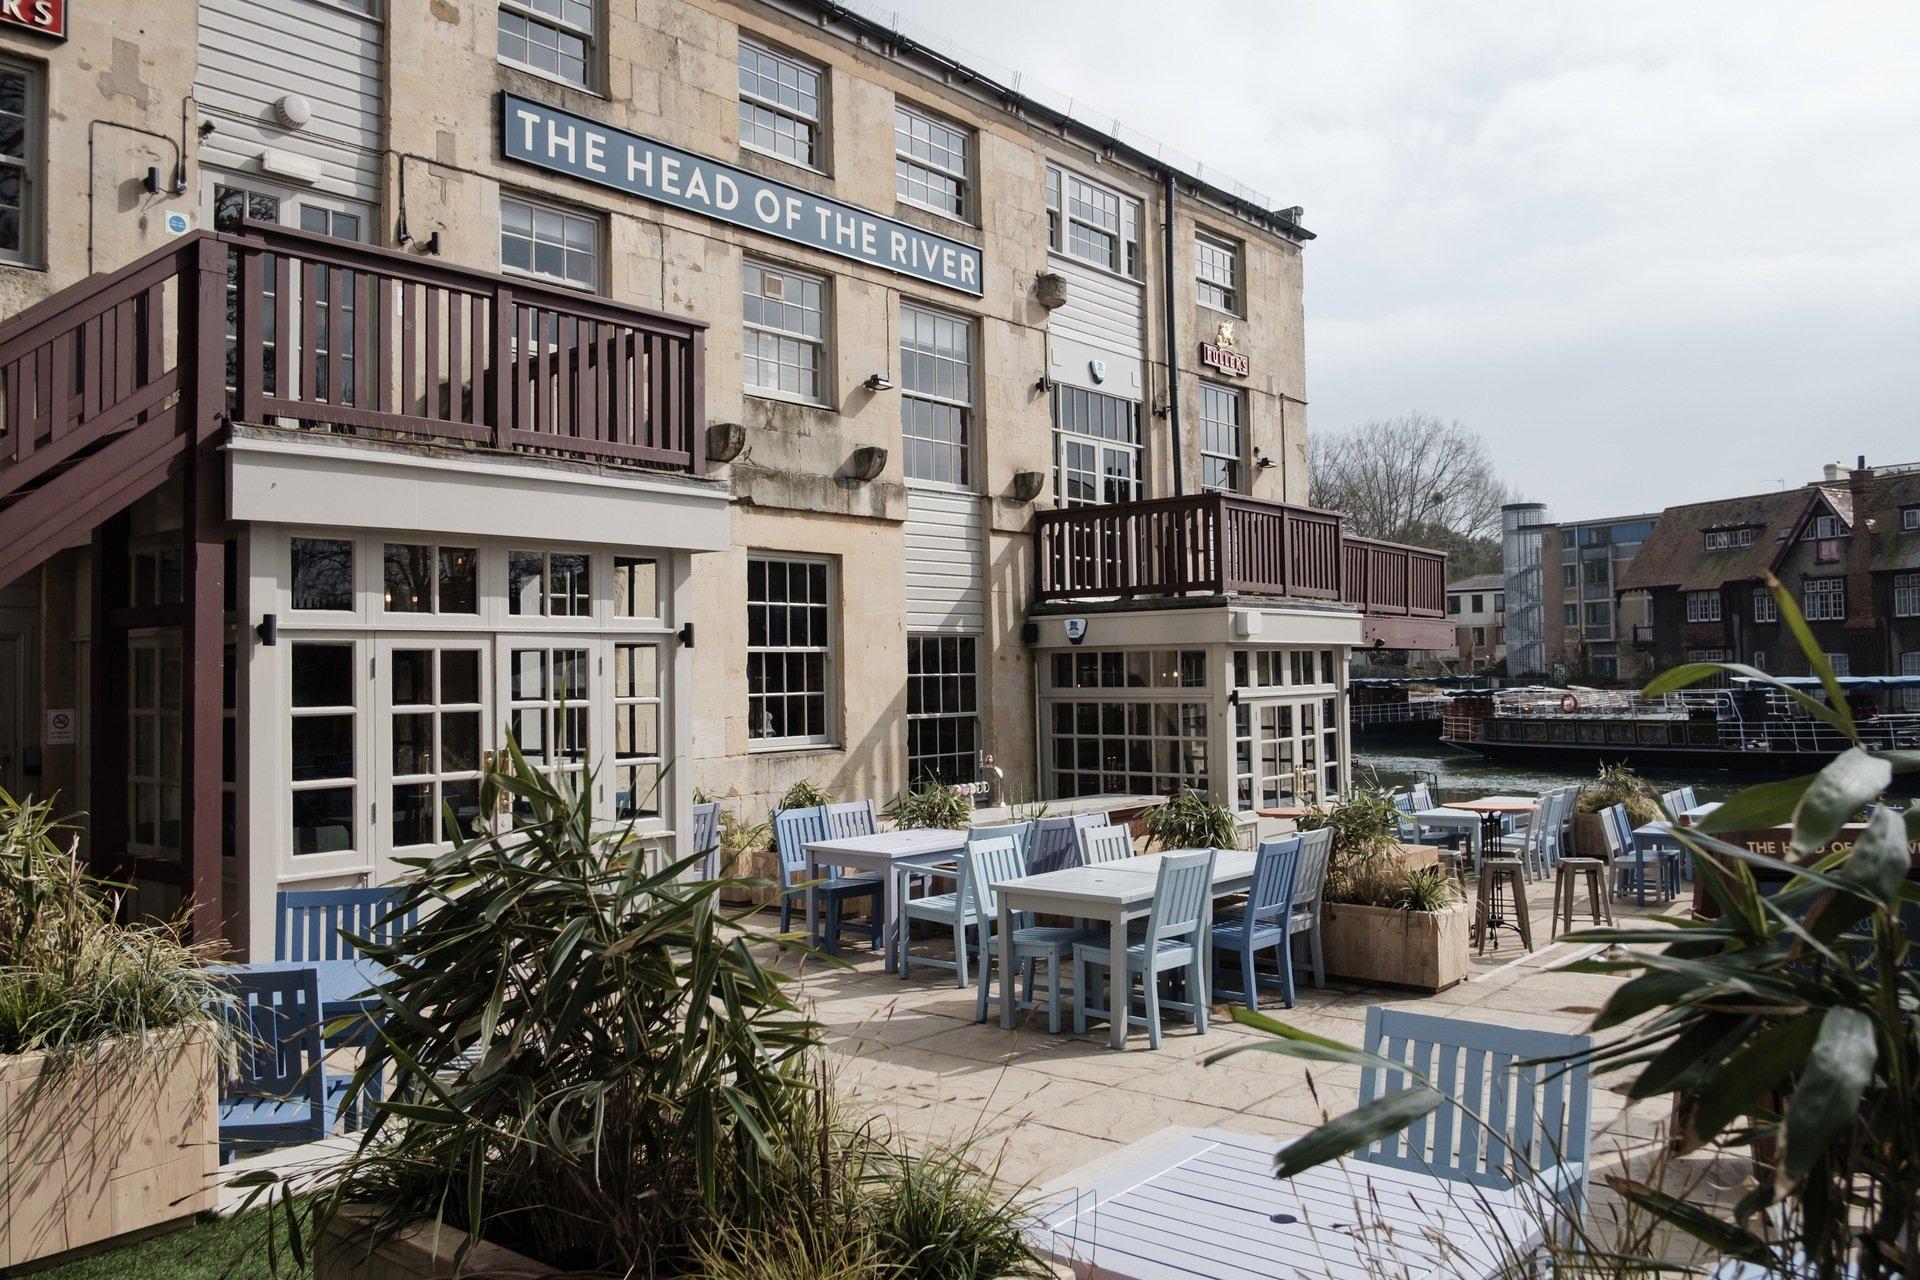 The Head of the River Restaurant, Pub & Bar Oxford - Exterior